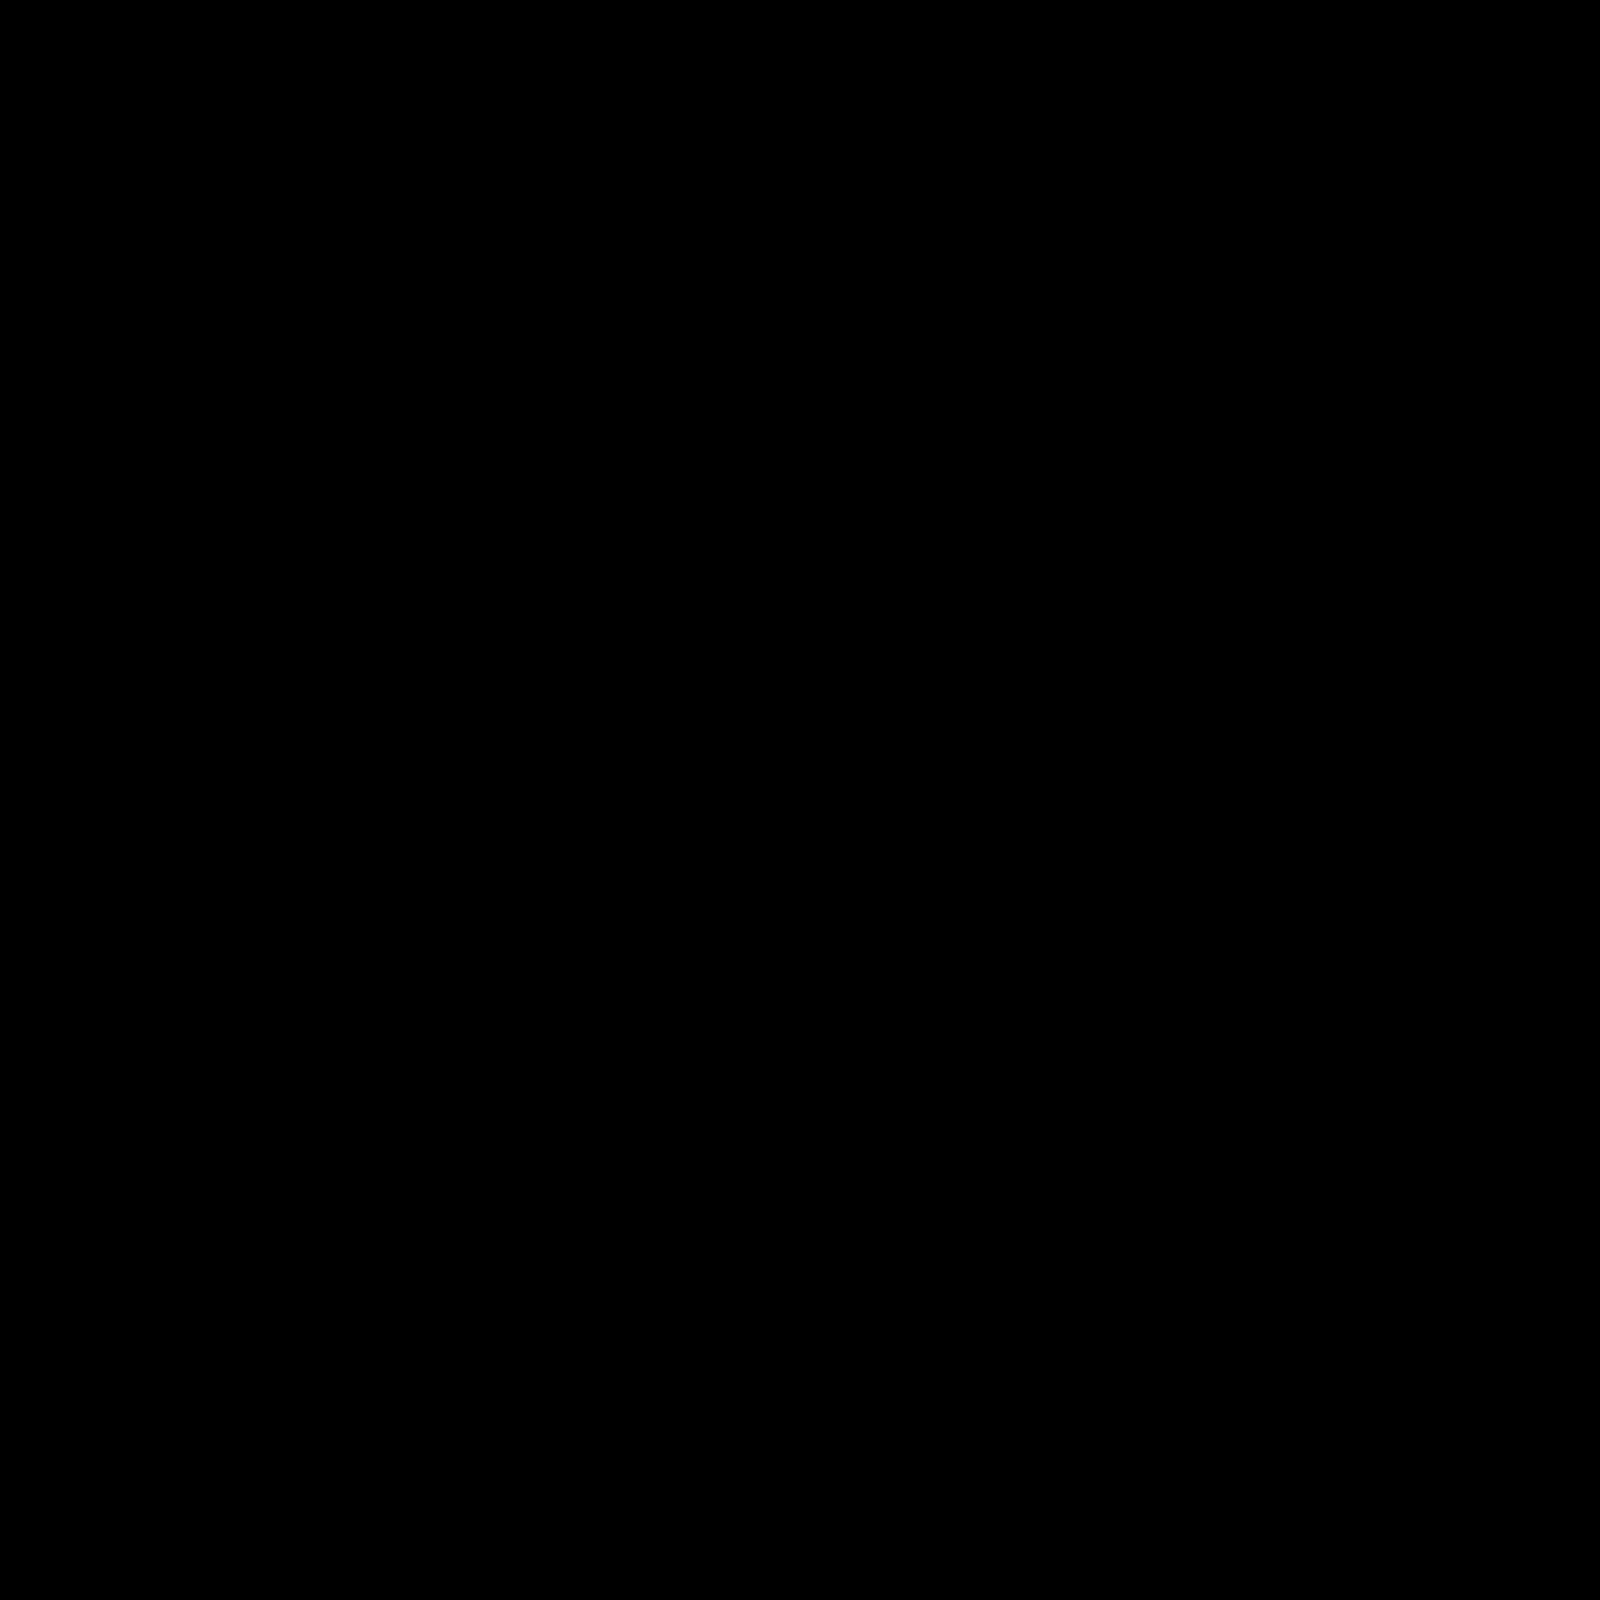 Dzban icon